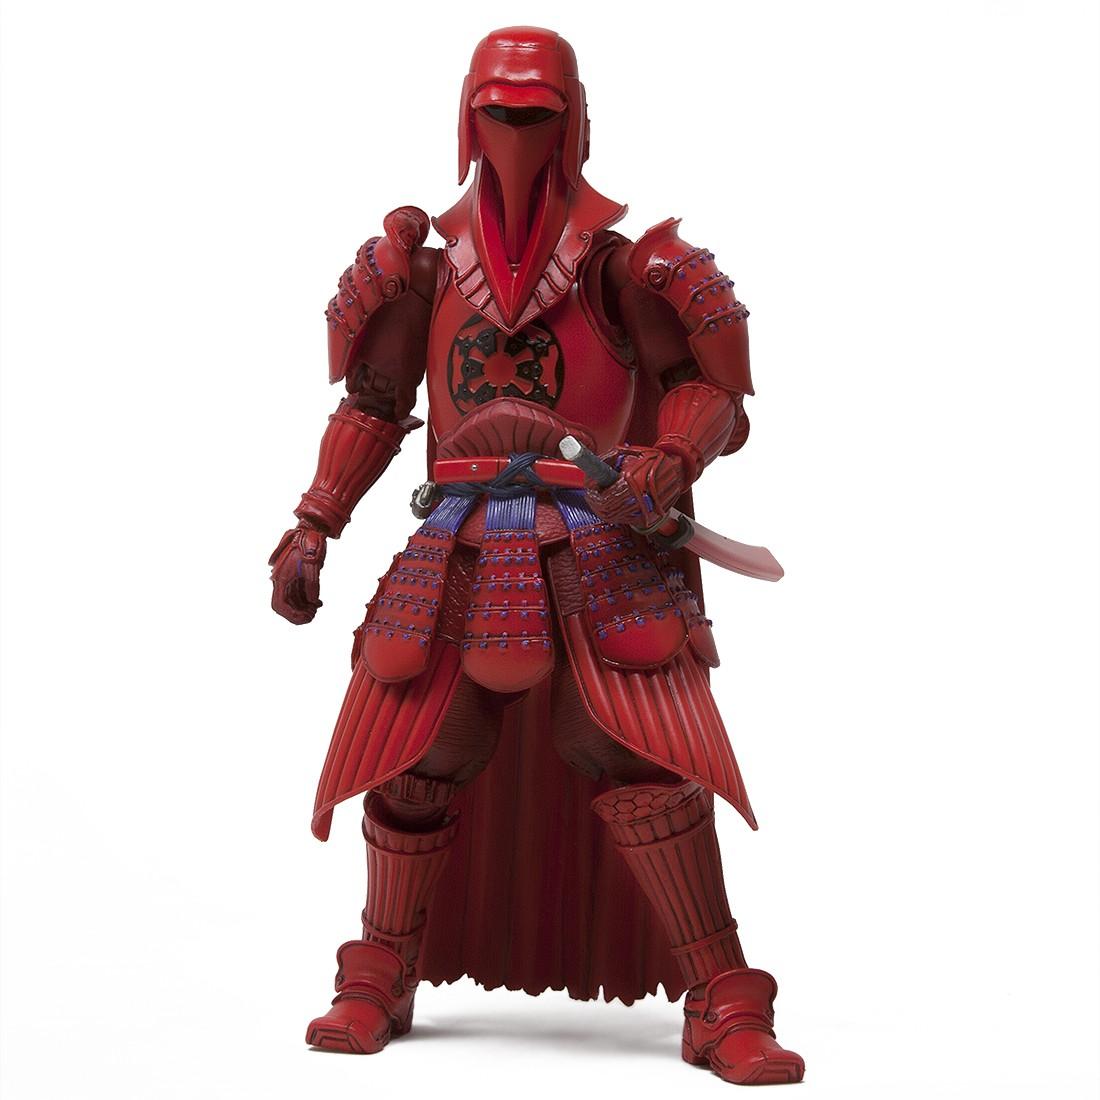 Bandai Meisho Movie Realization Star Wars Akazonae Royal Guard Figure (red)